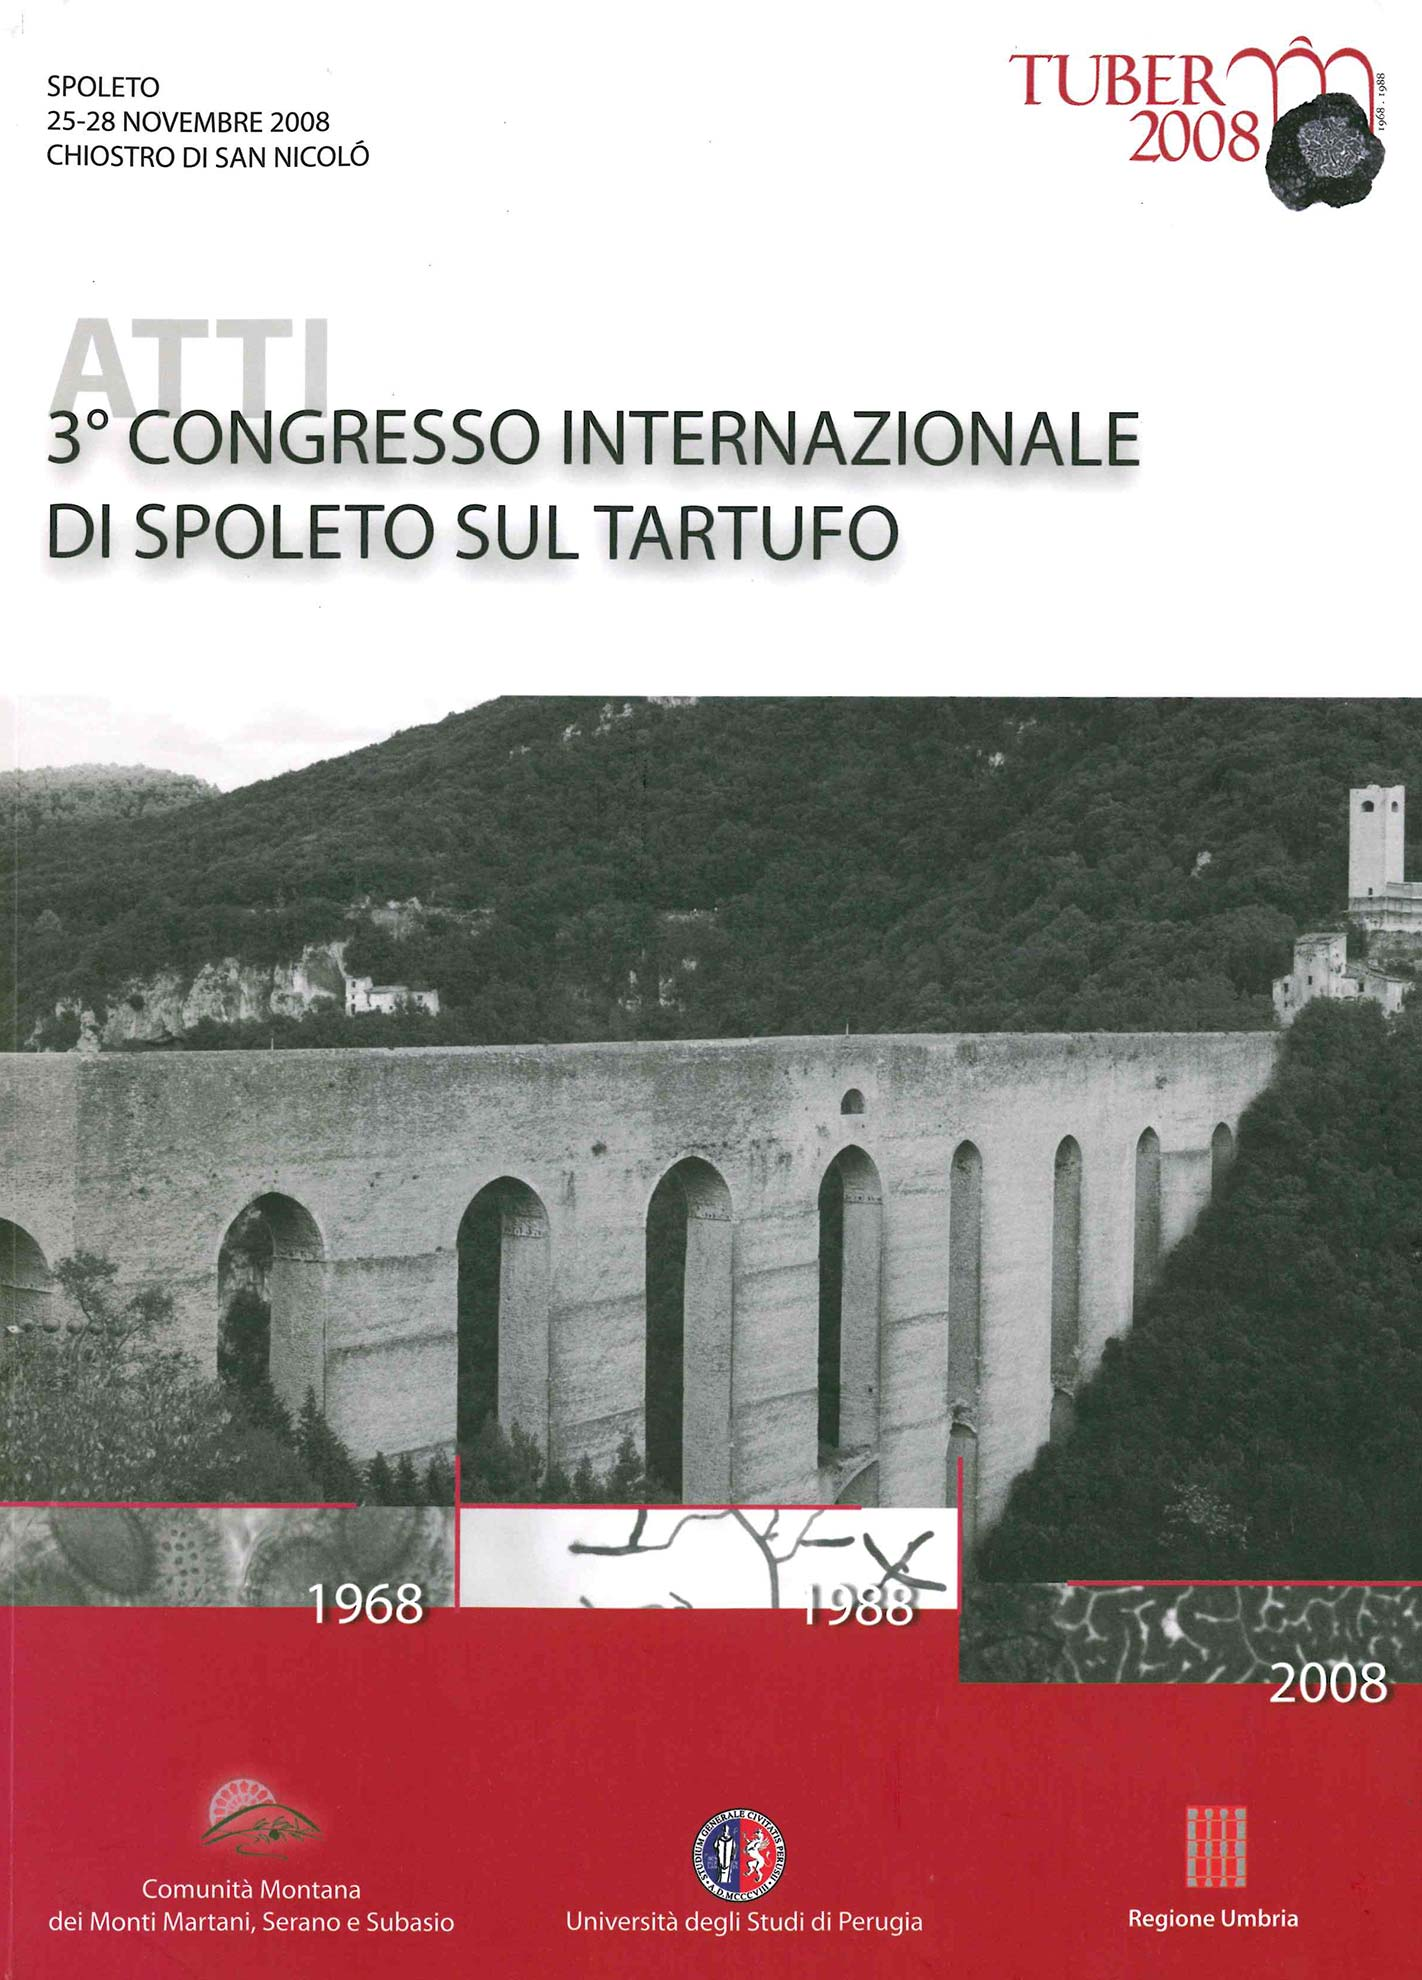 Grafica: Michelangelo Spadoni - Spoleto